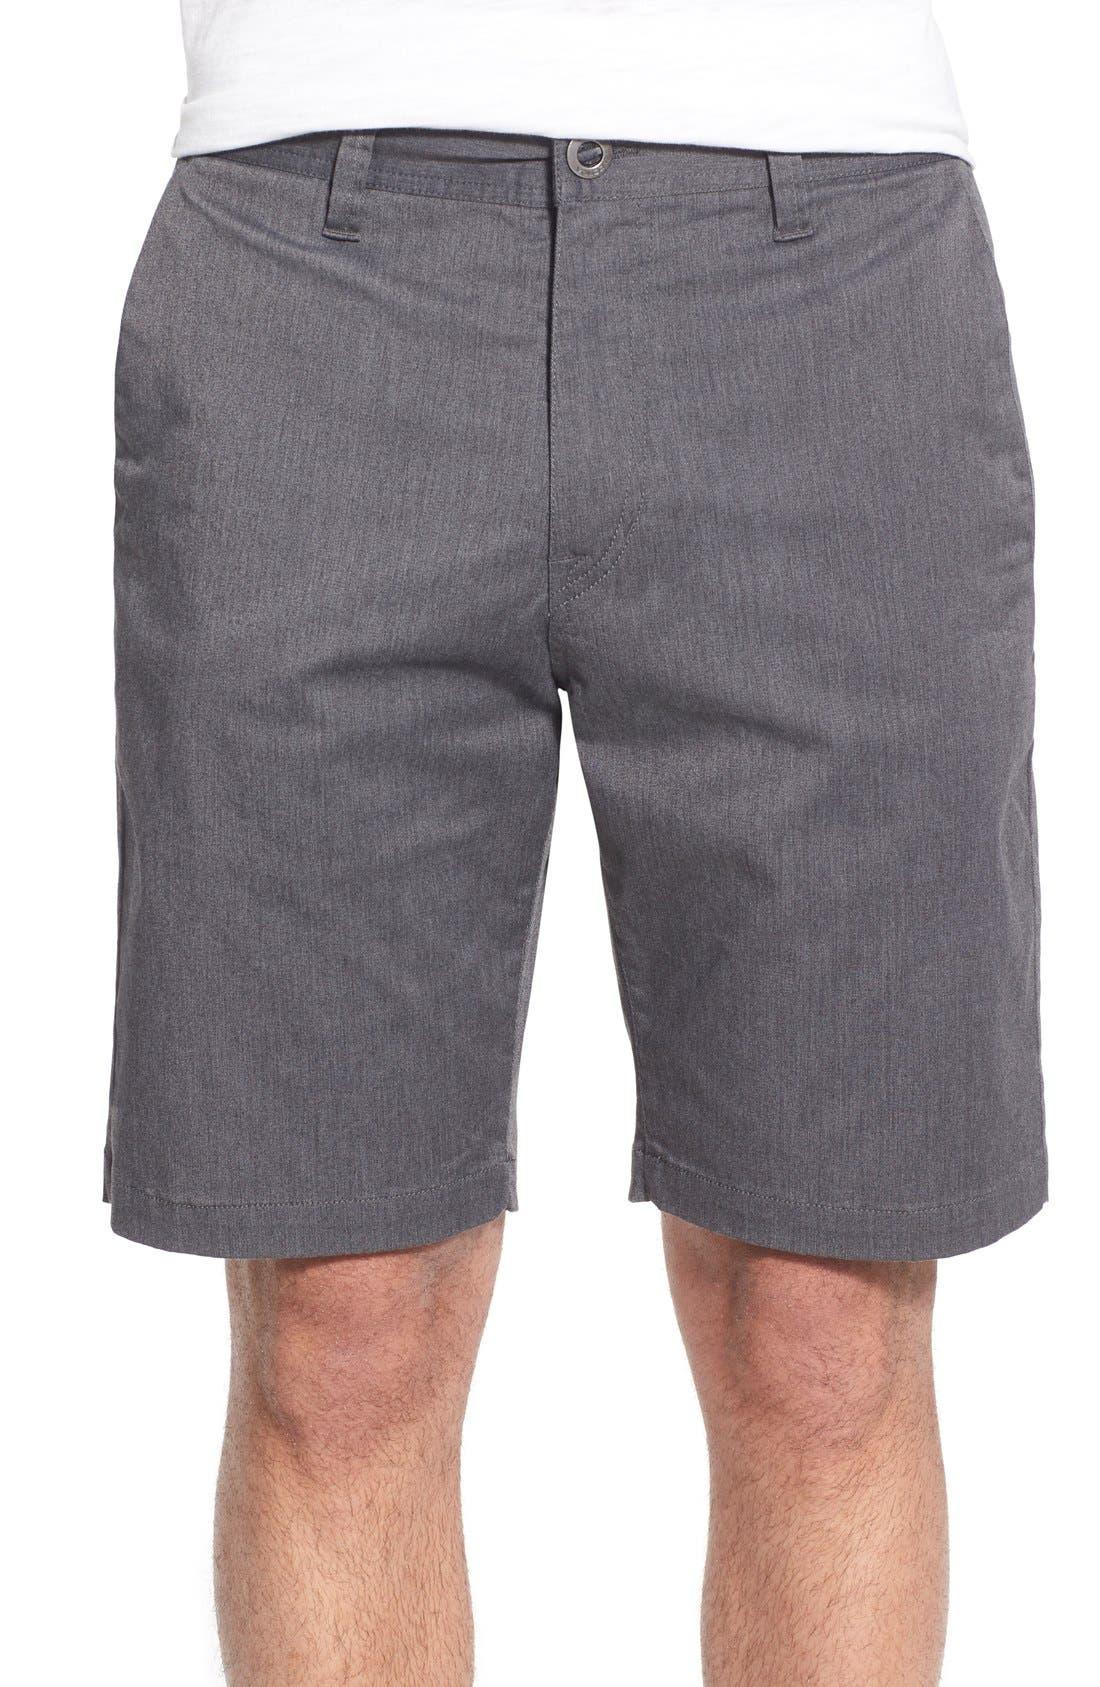 Main Image - Volcom 'Lightweight' Shorts